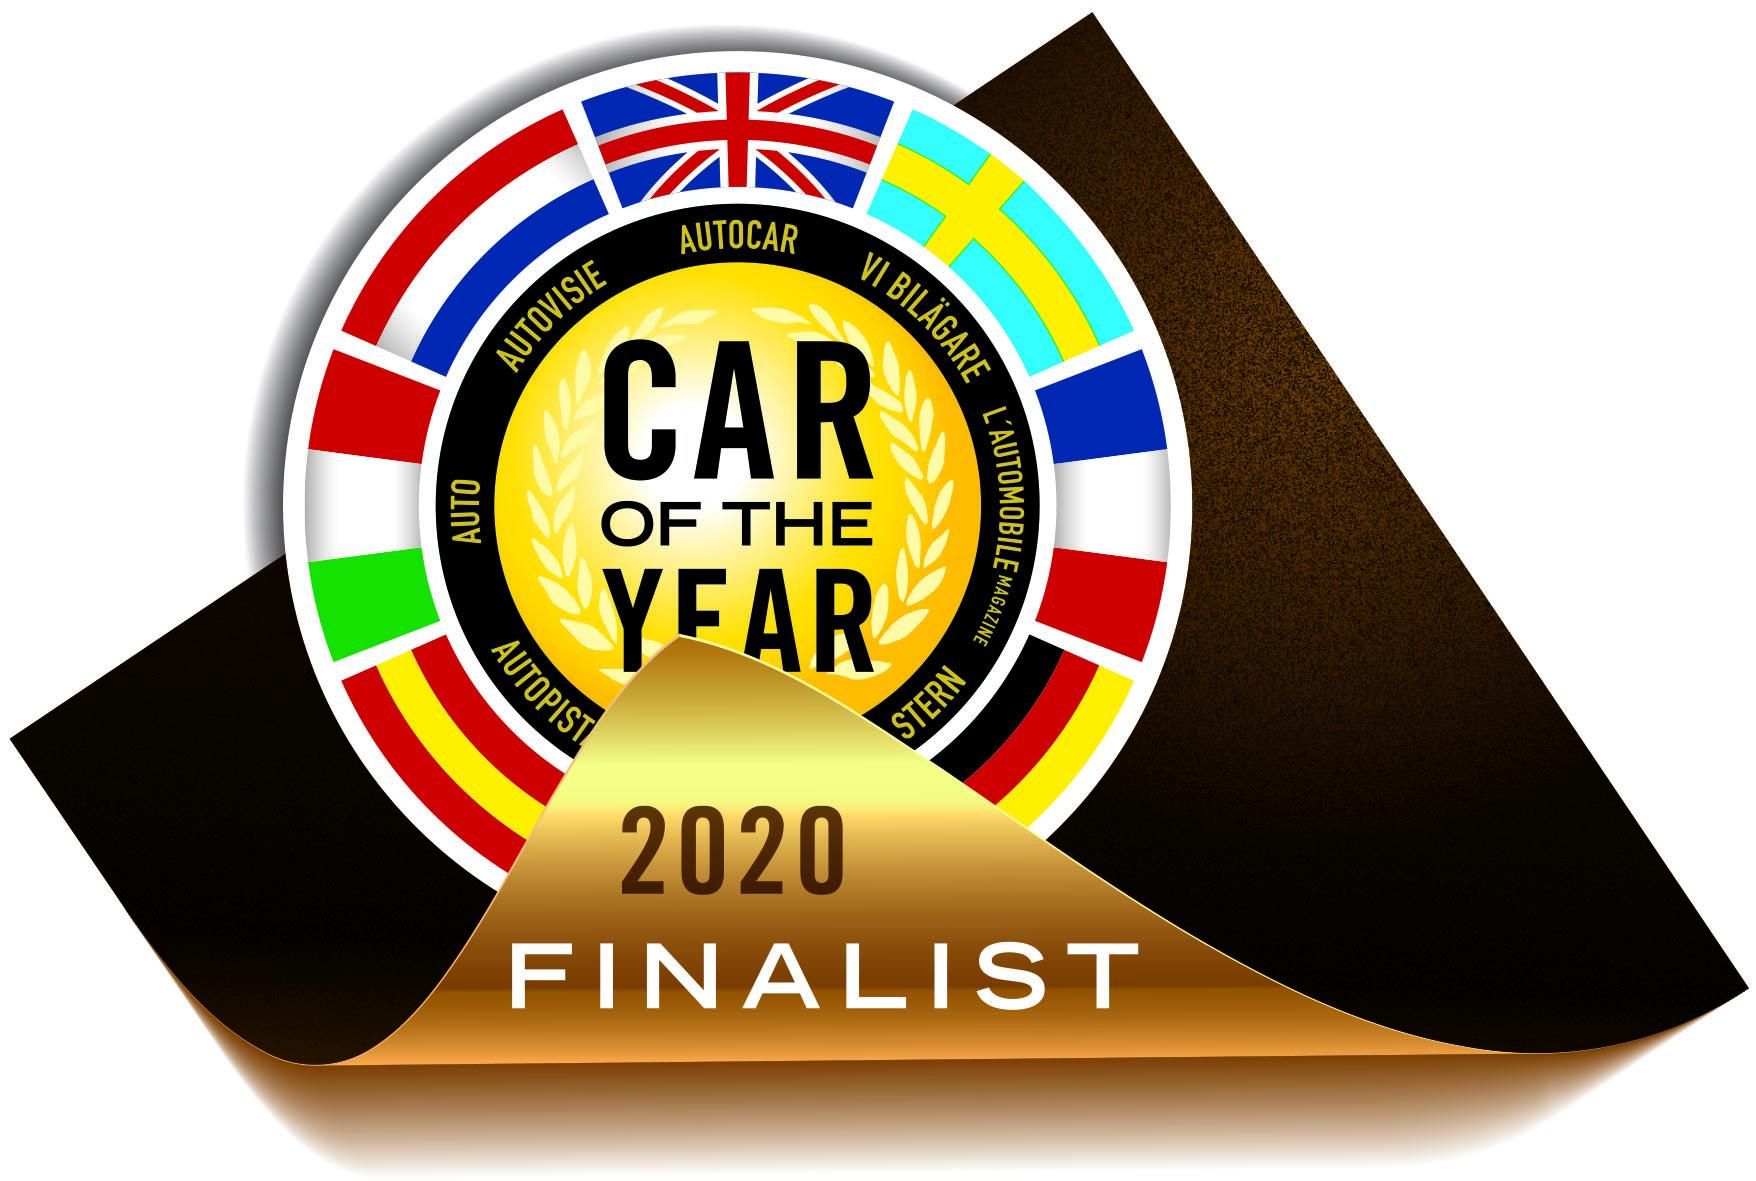 COTY 2020, ECCO LE 7 FINALISTE